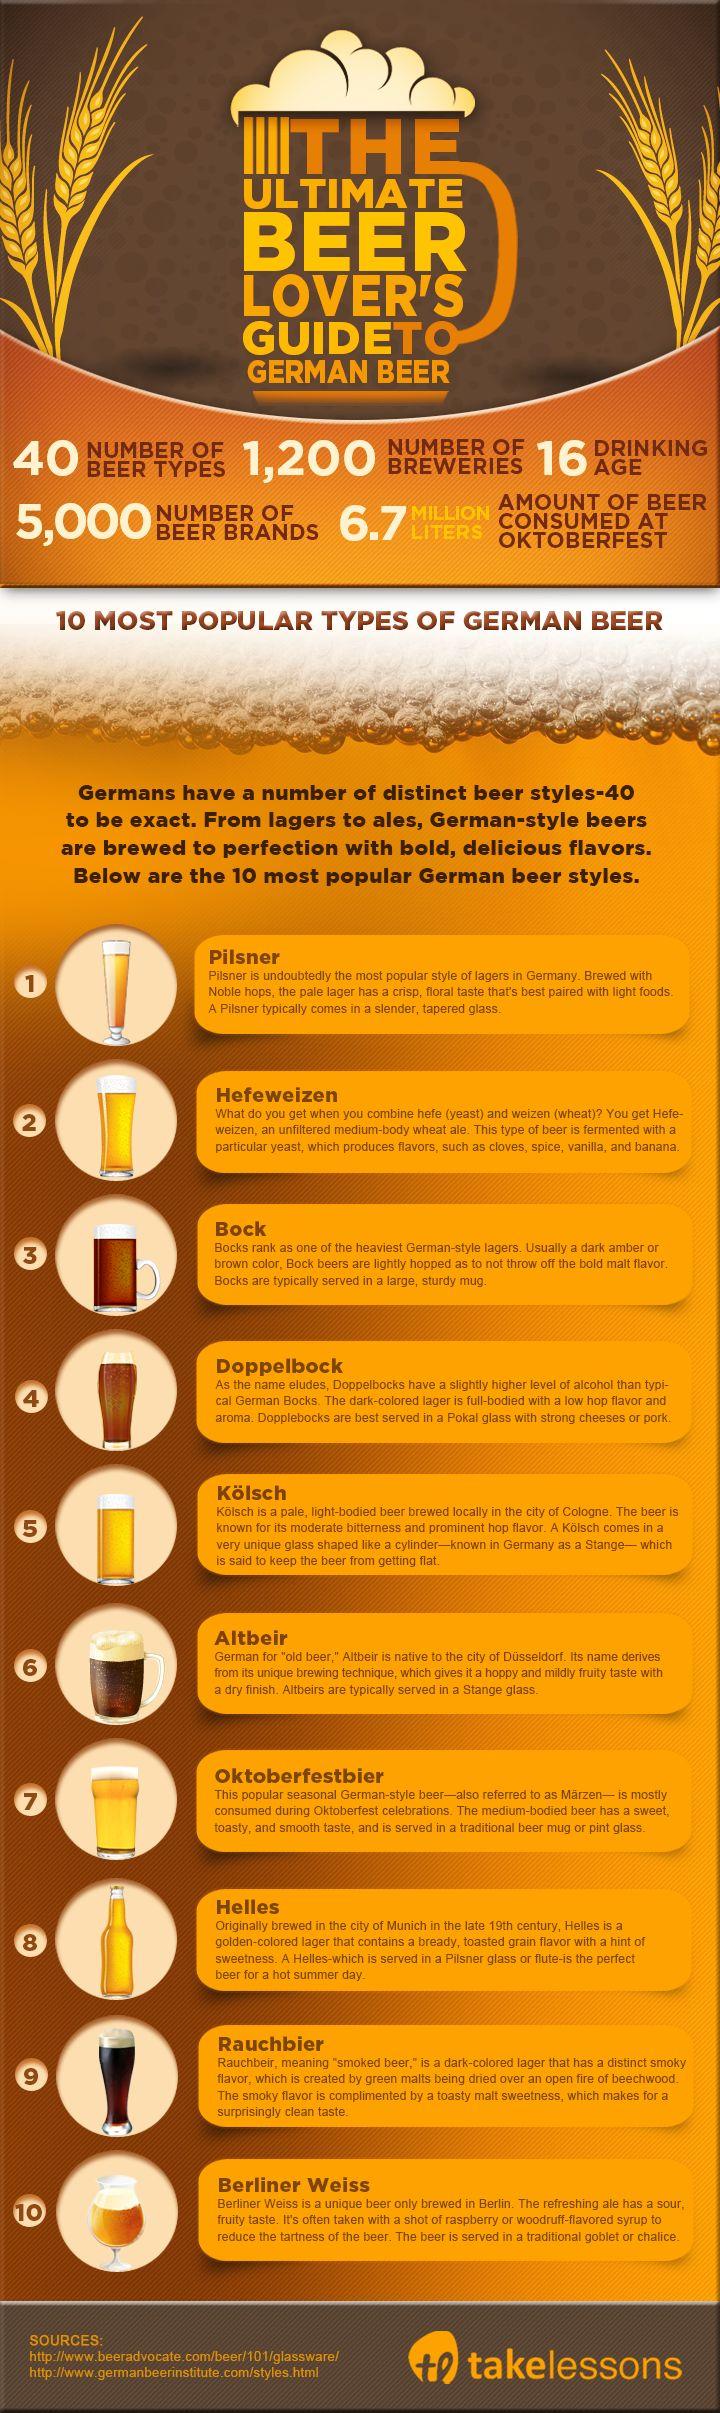 The Ultimate Beer Lover's Guide to German Beers [Infographic] http://takelessons.com/blog/german-beers-z12?utm_source=social&utm_medium=blog&utm_campaign=pinterest